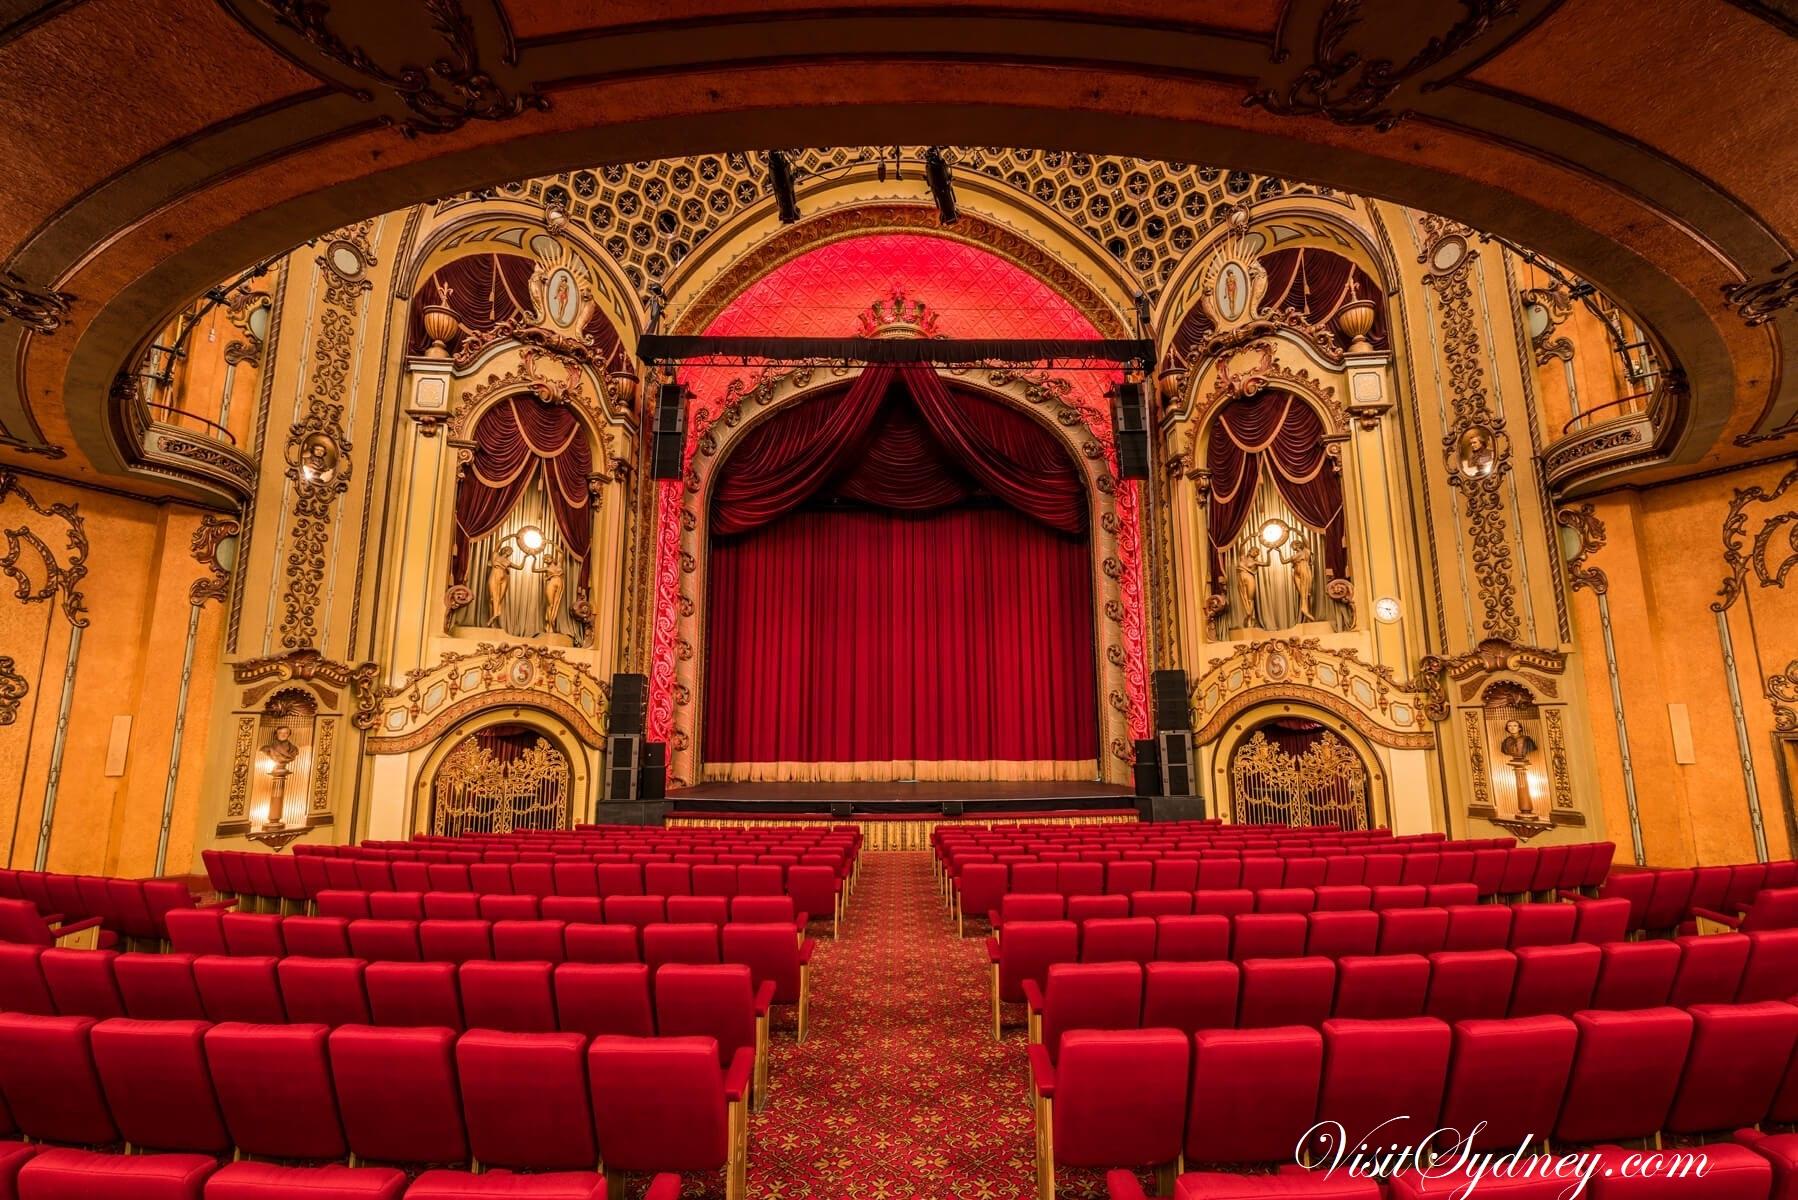 State Theatre, Sydney